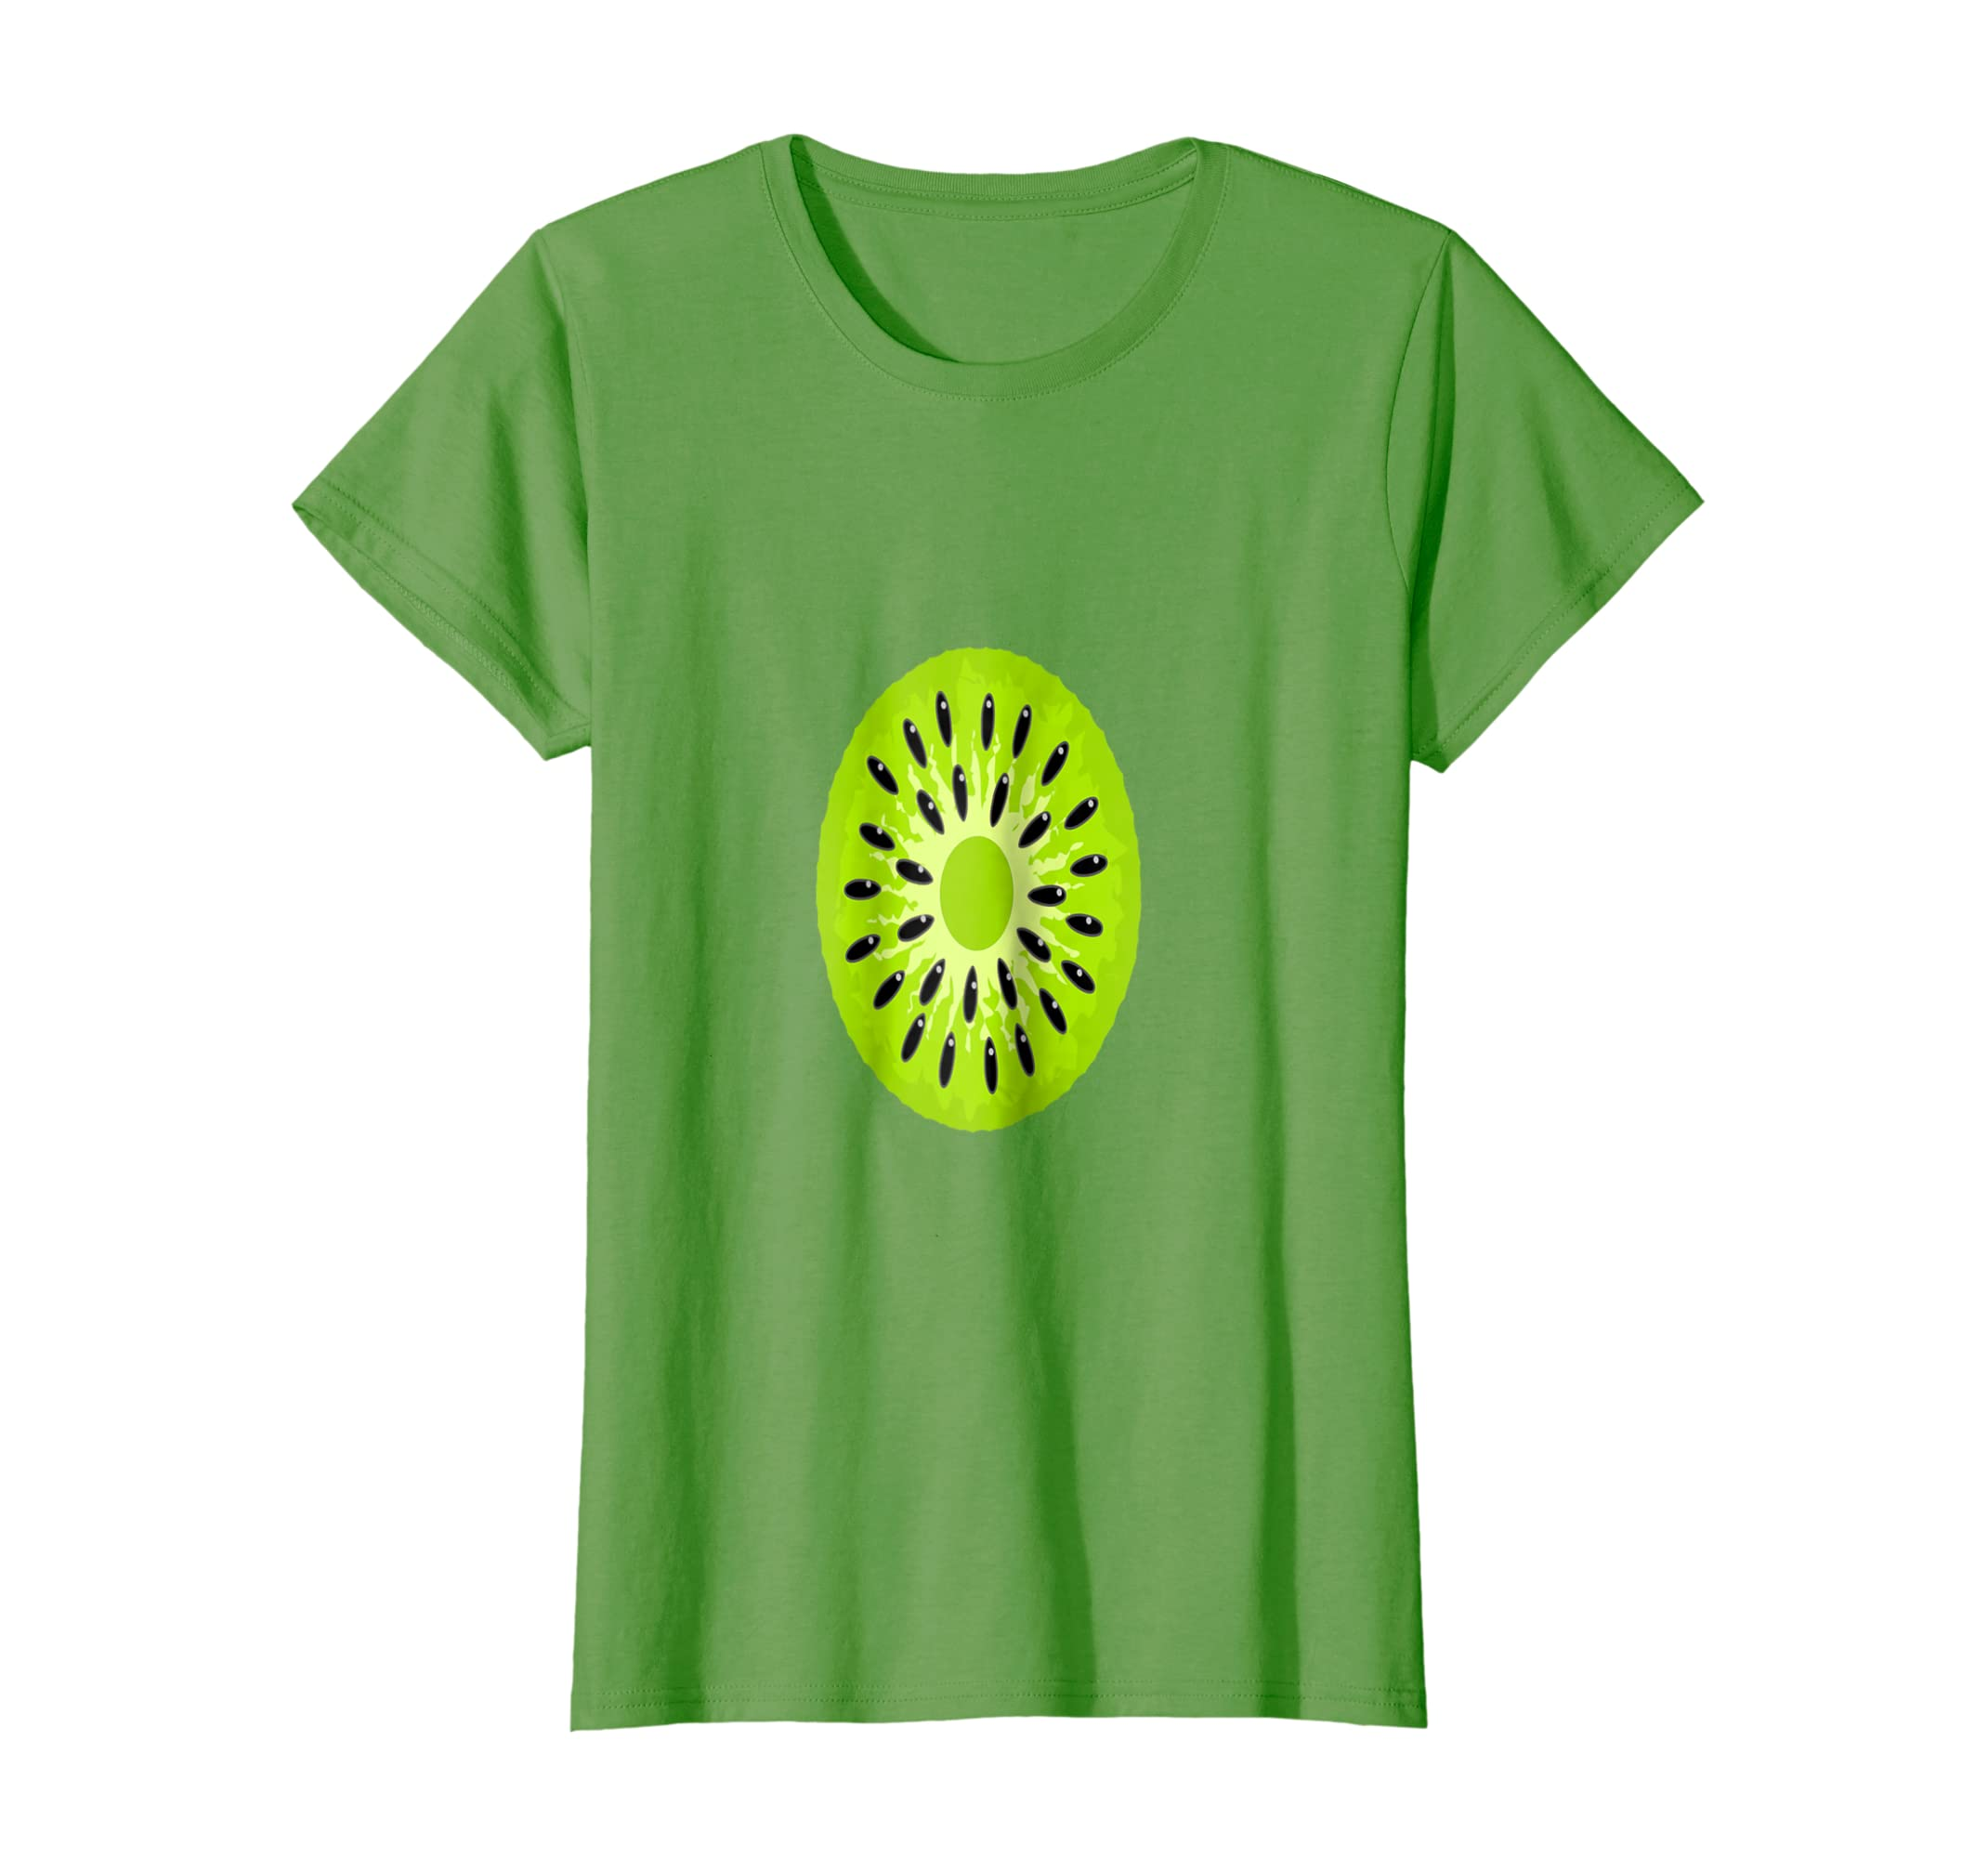 Amazon Kiwi Costume Shirt Funny Design For Halloween Day